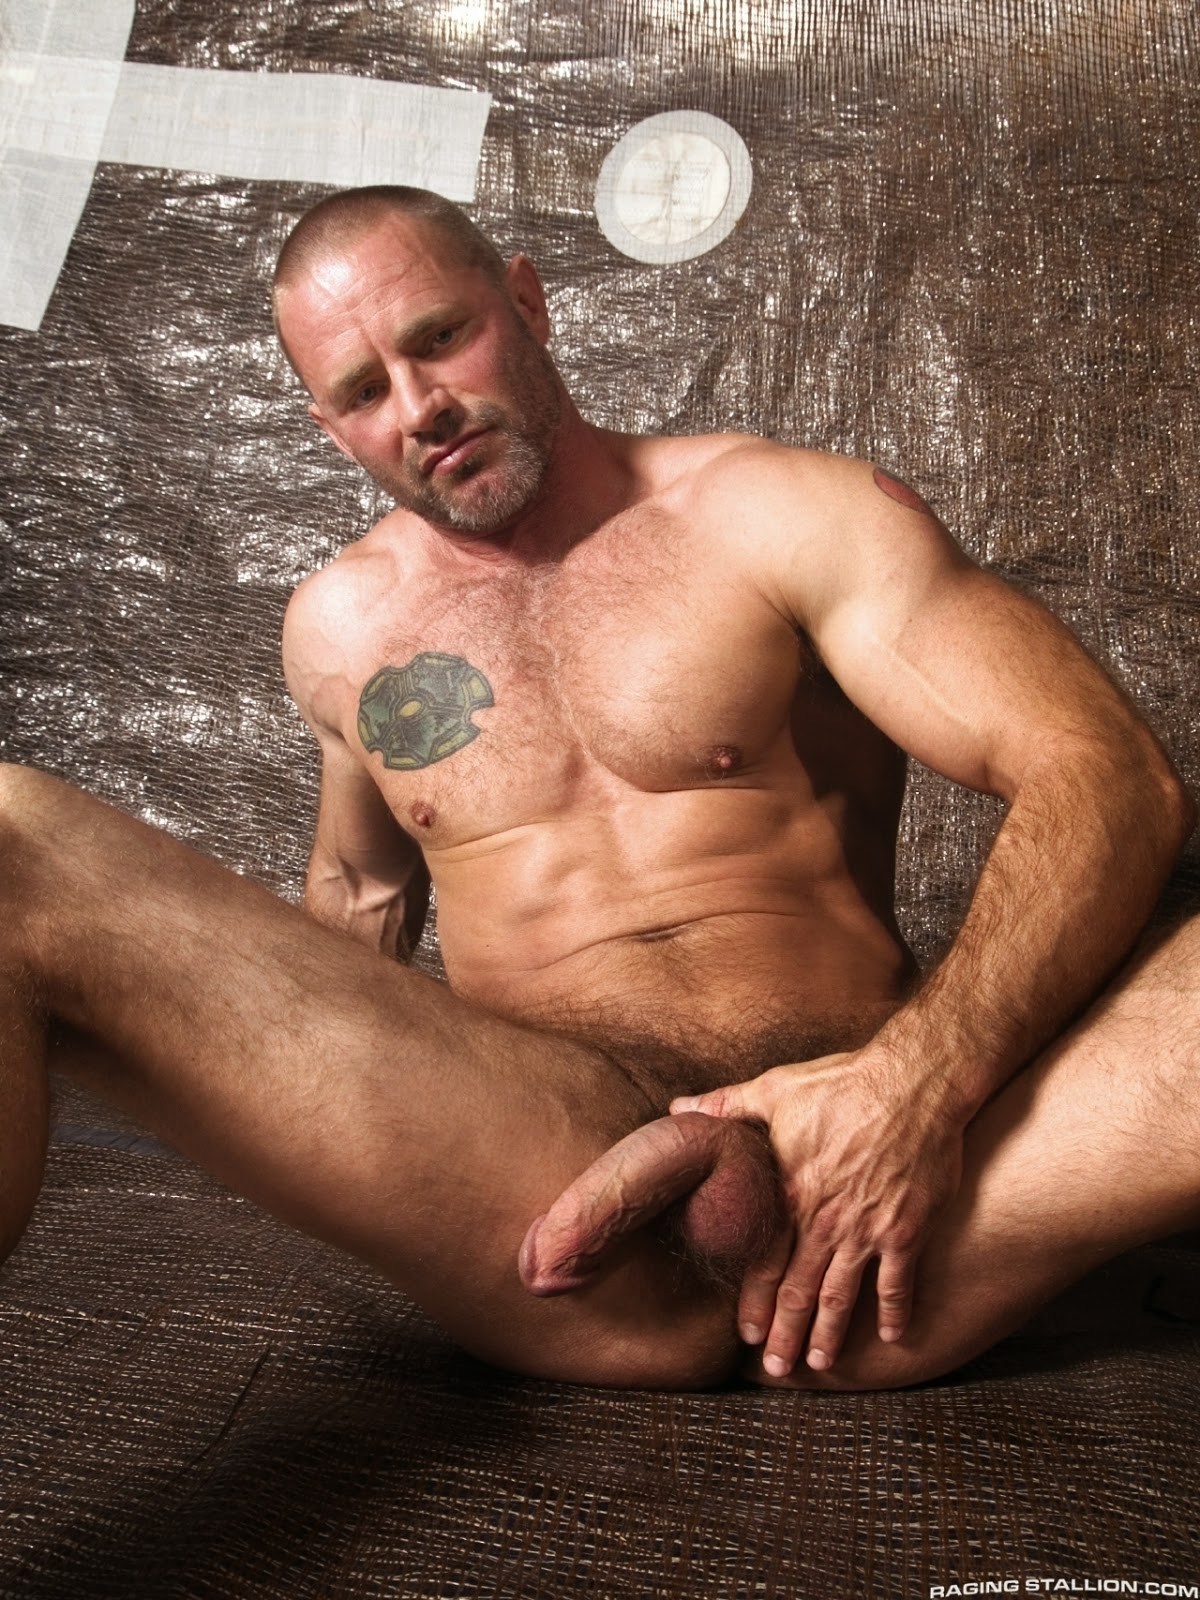 August Habarcs Porno showing xxx images for brendan killen porn star xxx | www